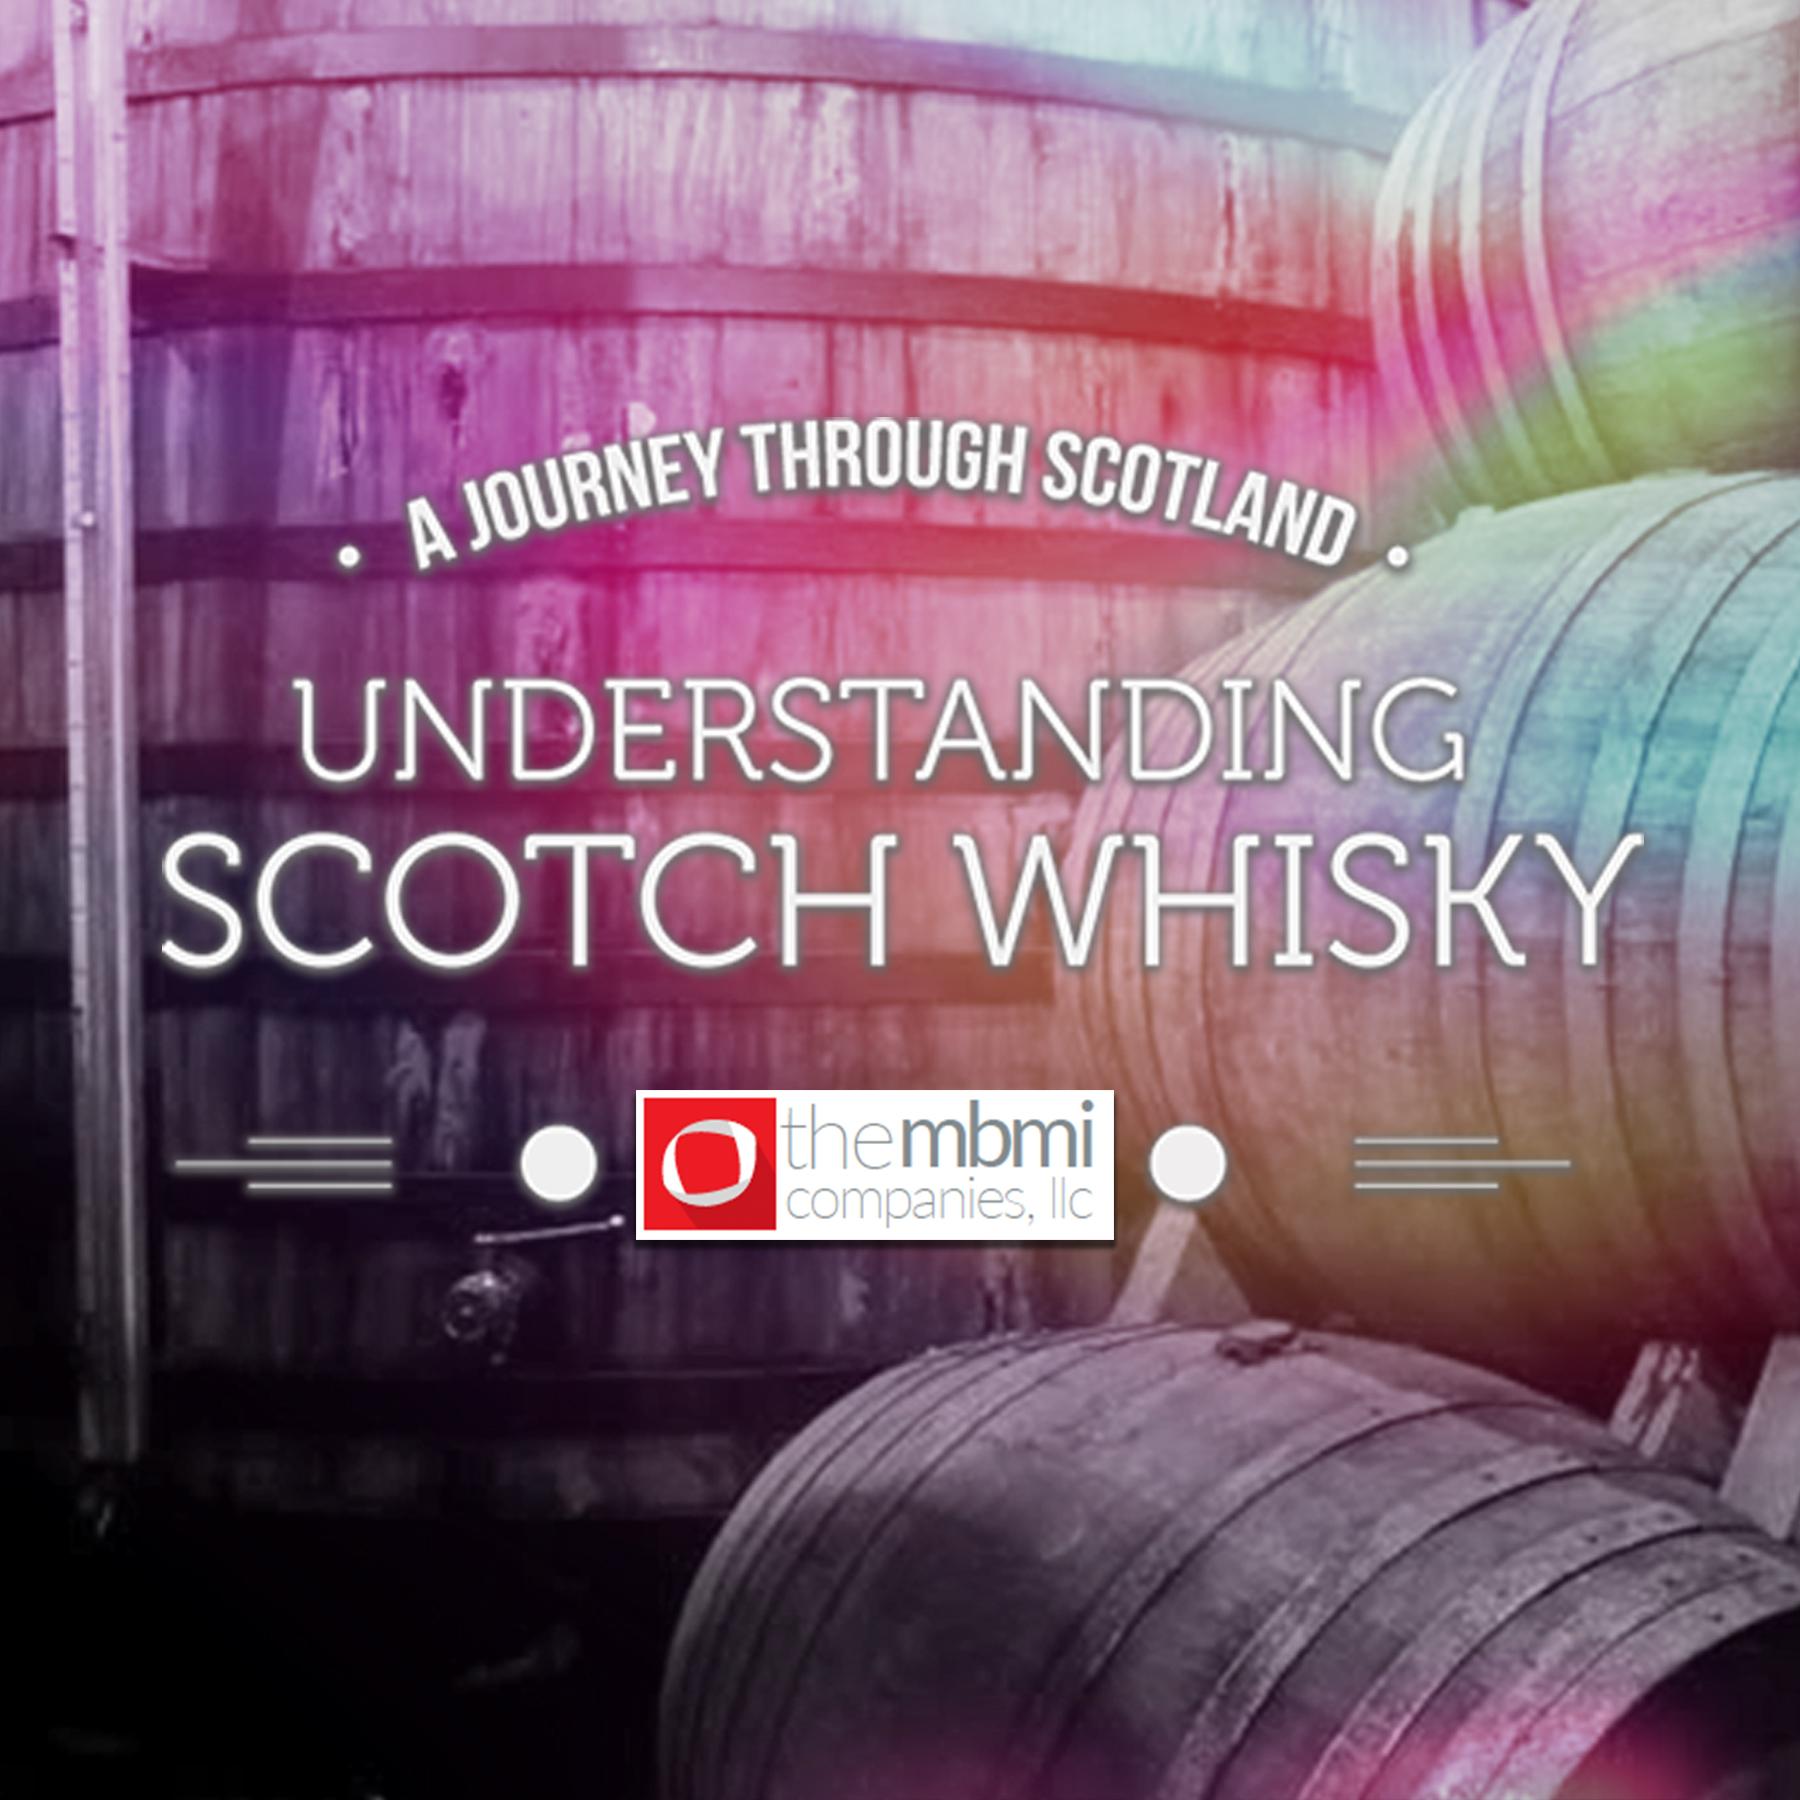 A Journey Through Scotland: Understanding Scotch Whisky